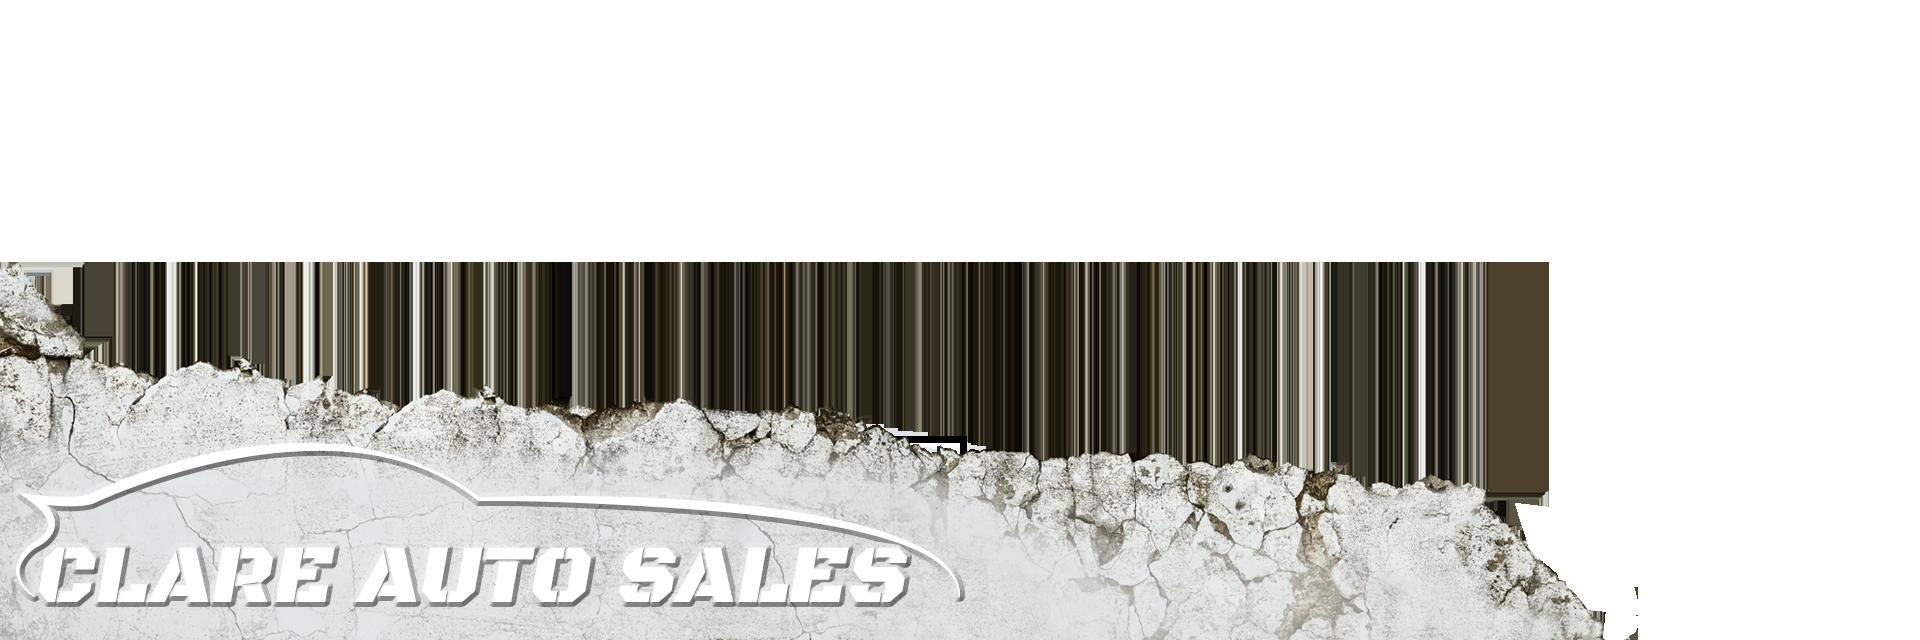 Clare Auto Sales, Inc.